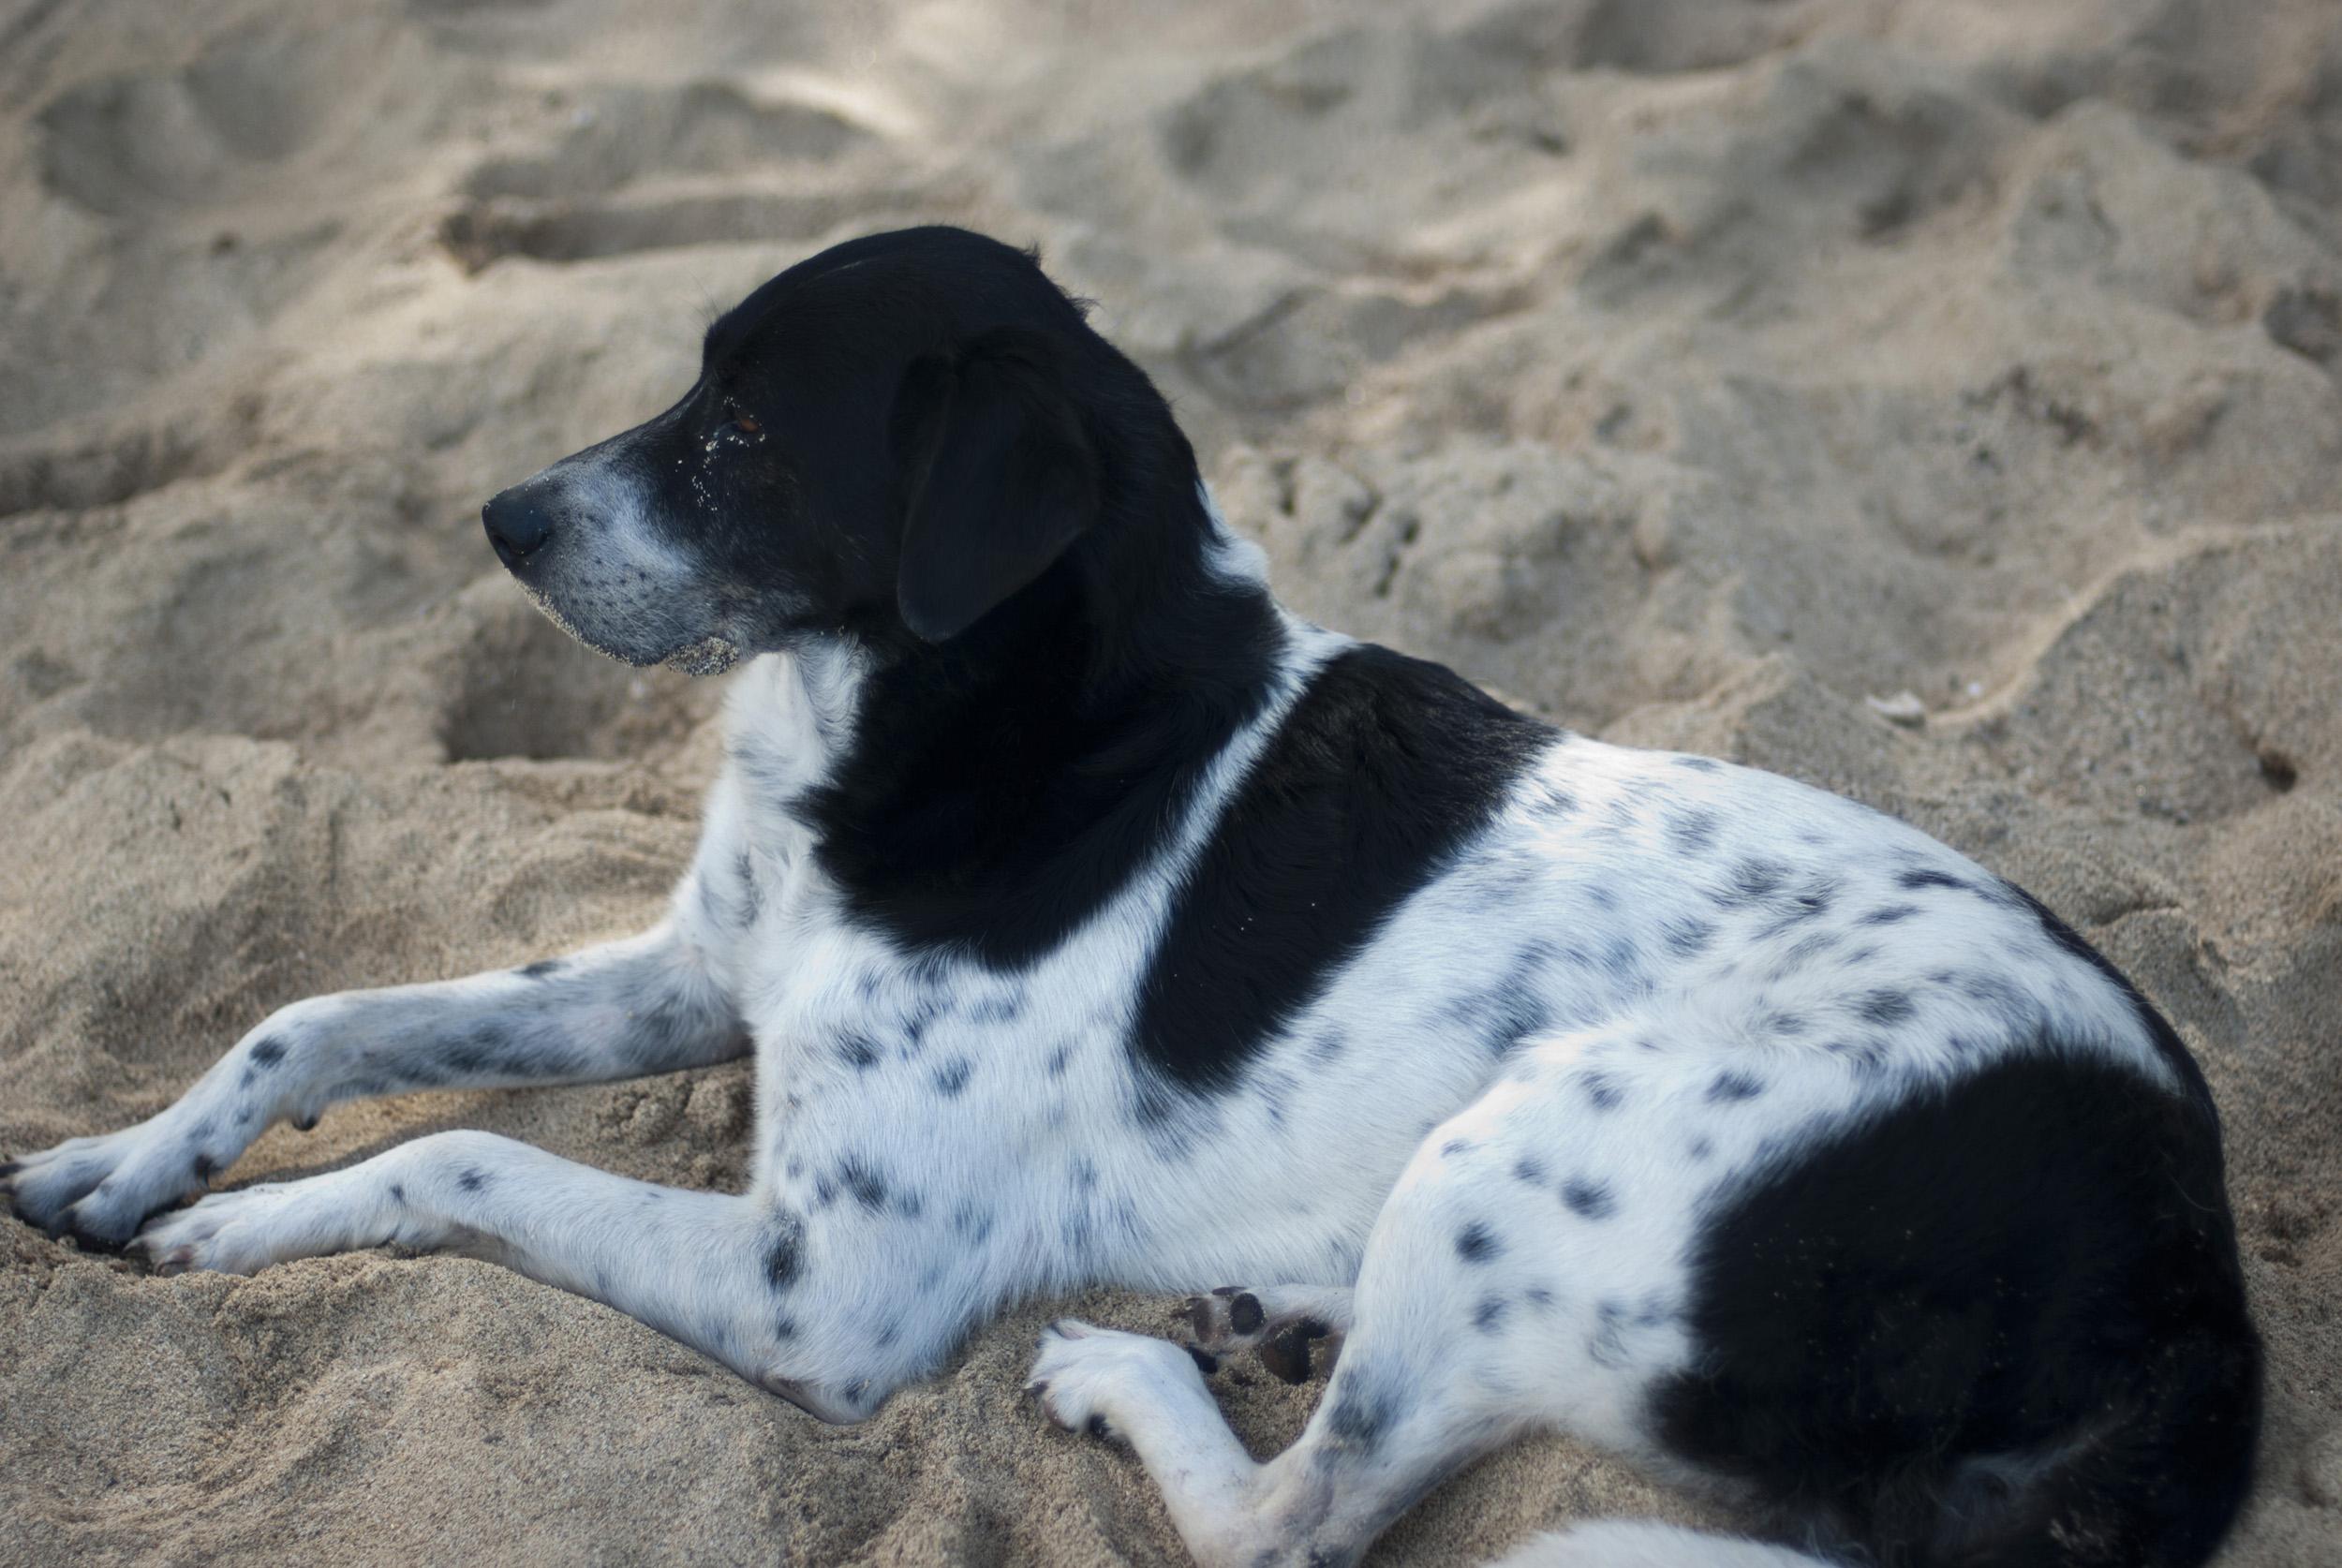 Black and white dog animal photos